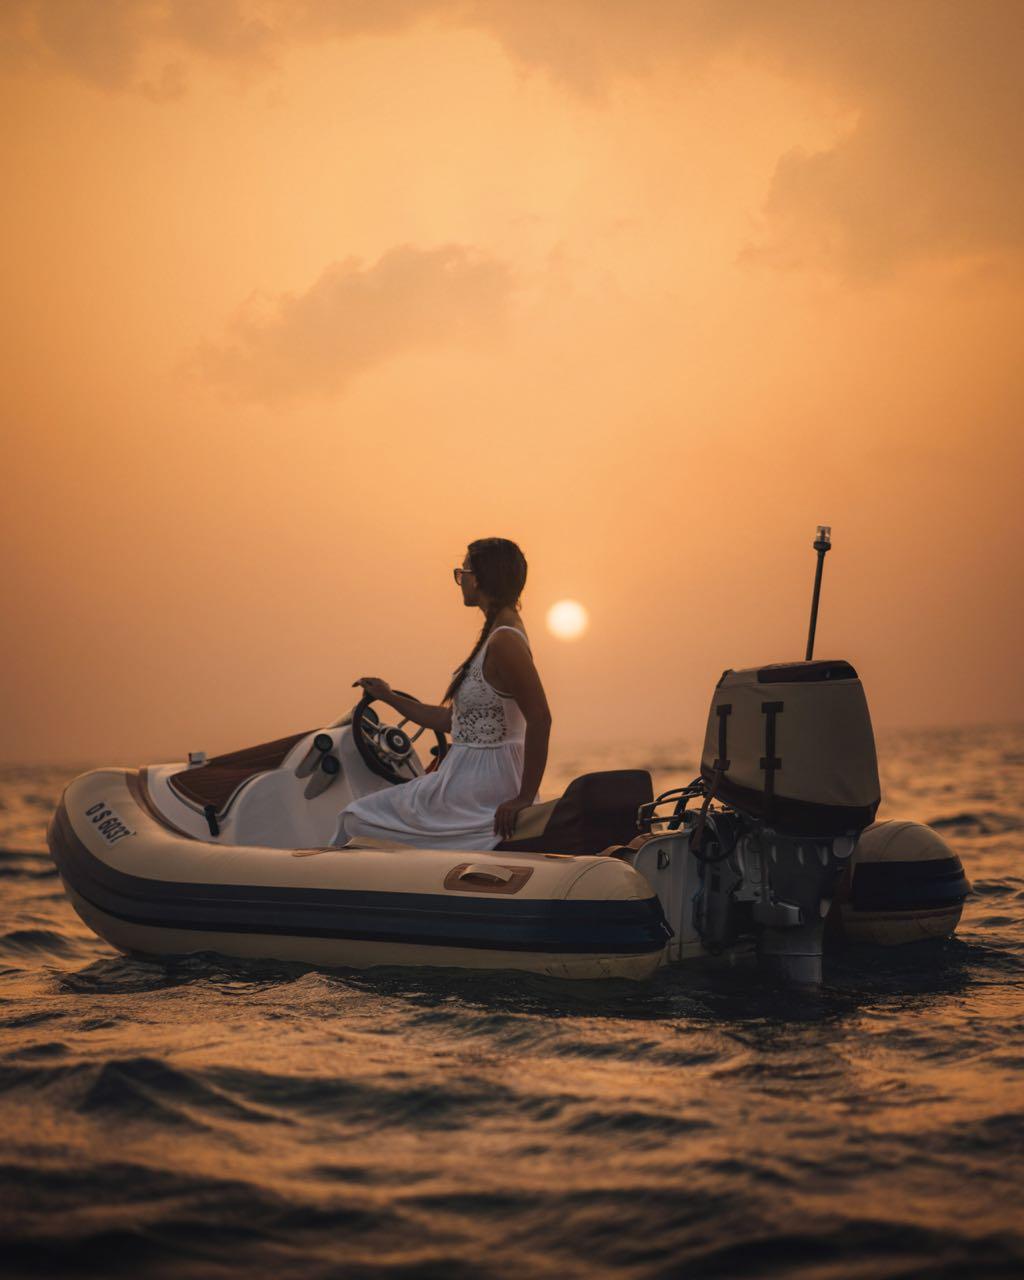 sel-drive-boat-hero-dubai-lustforthesublime